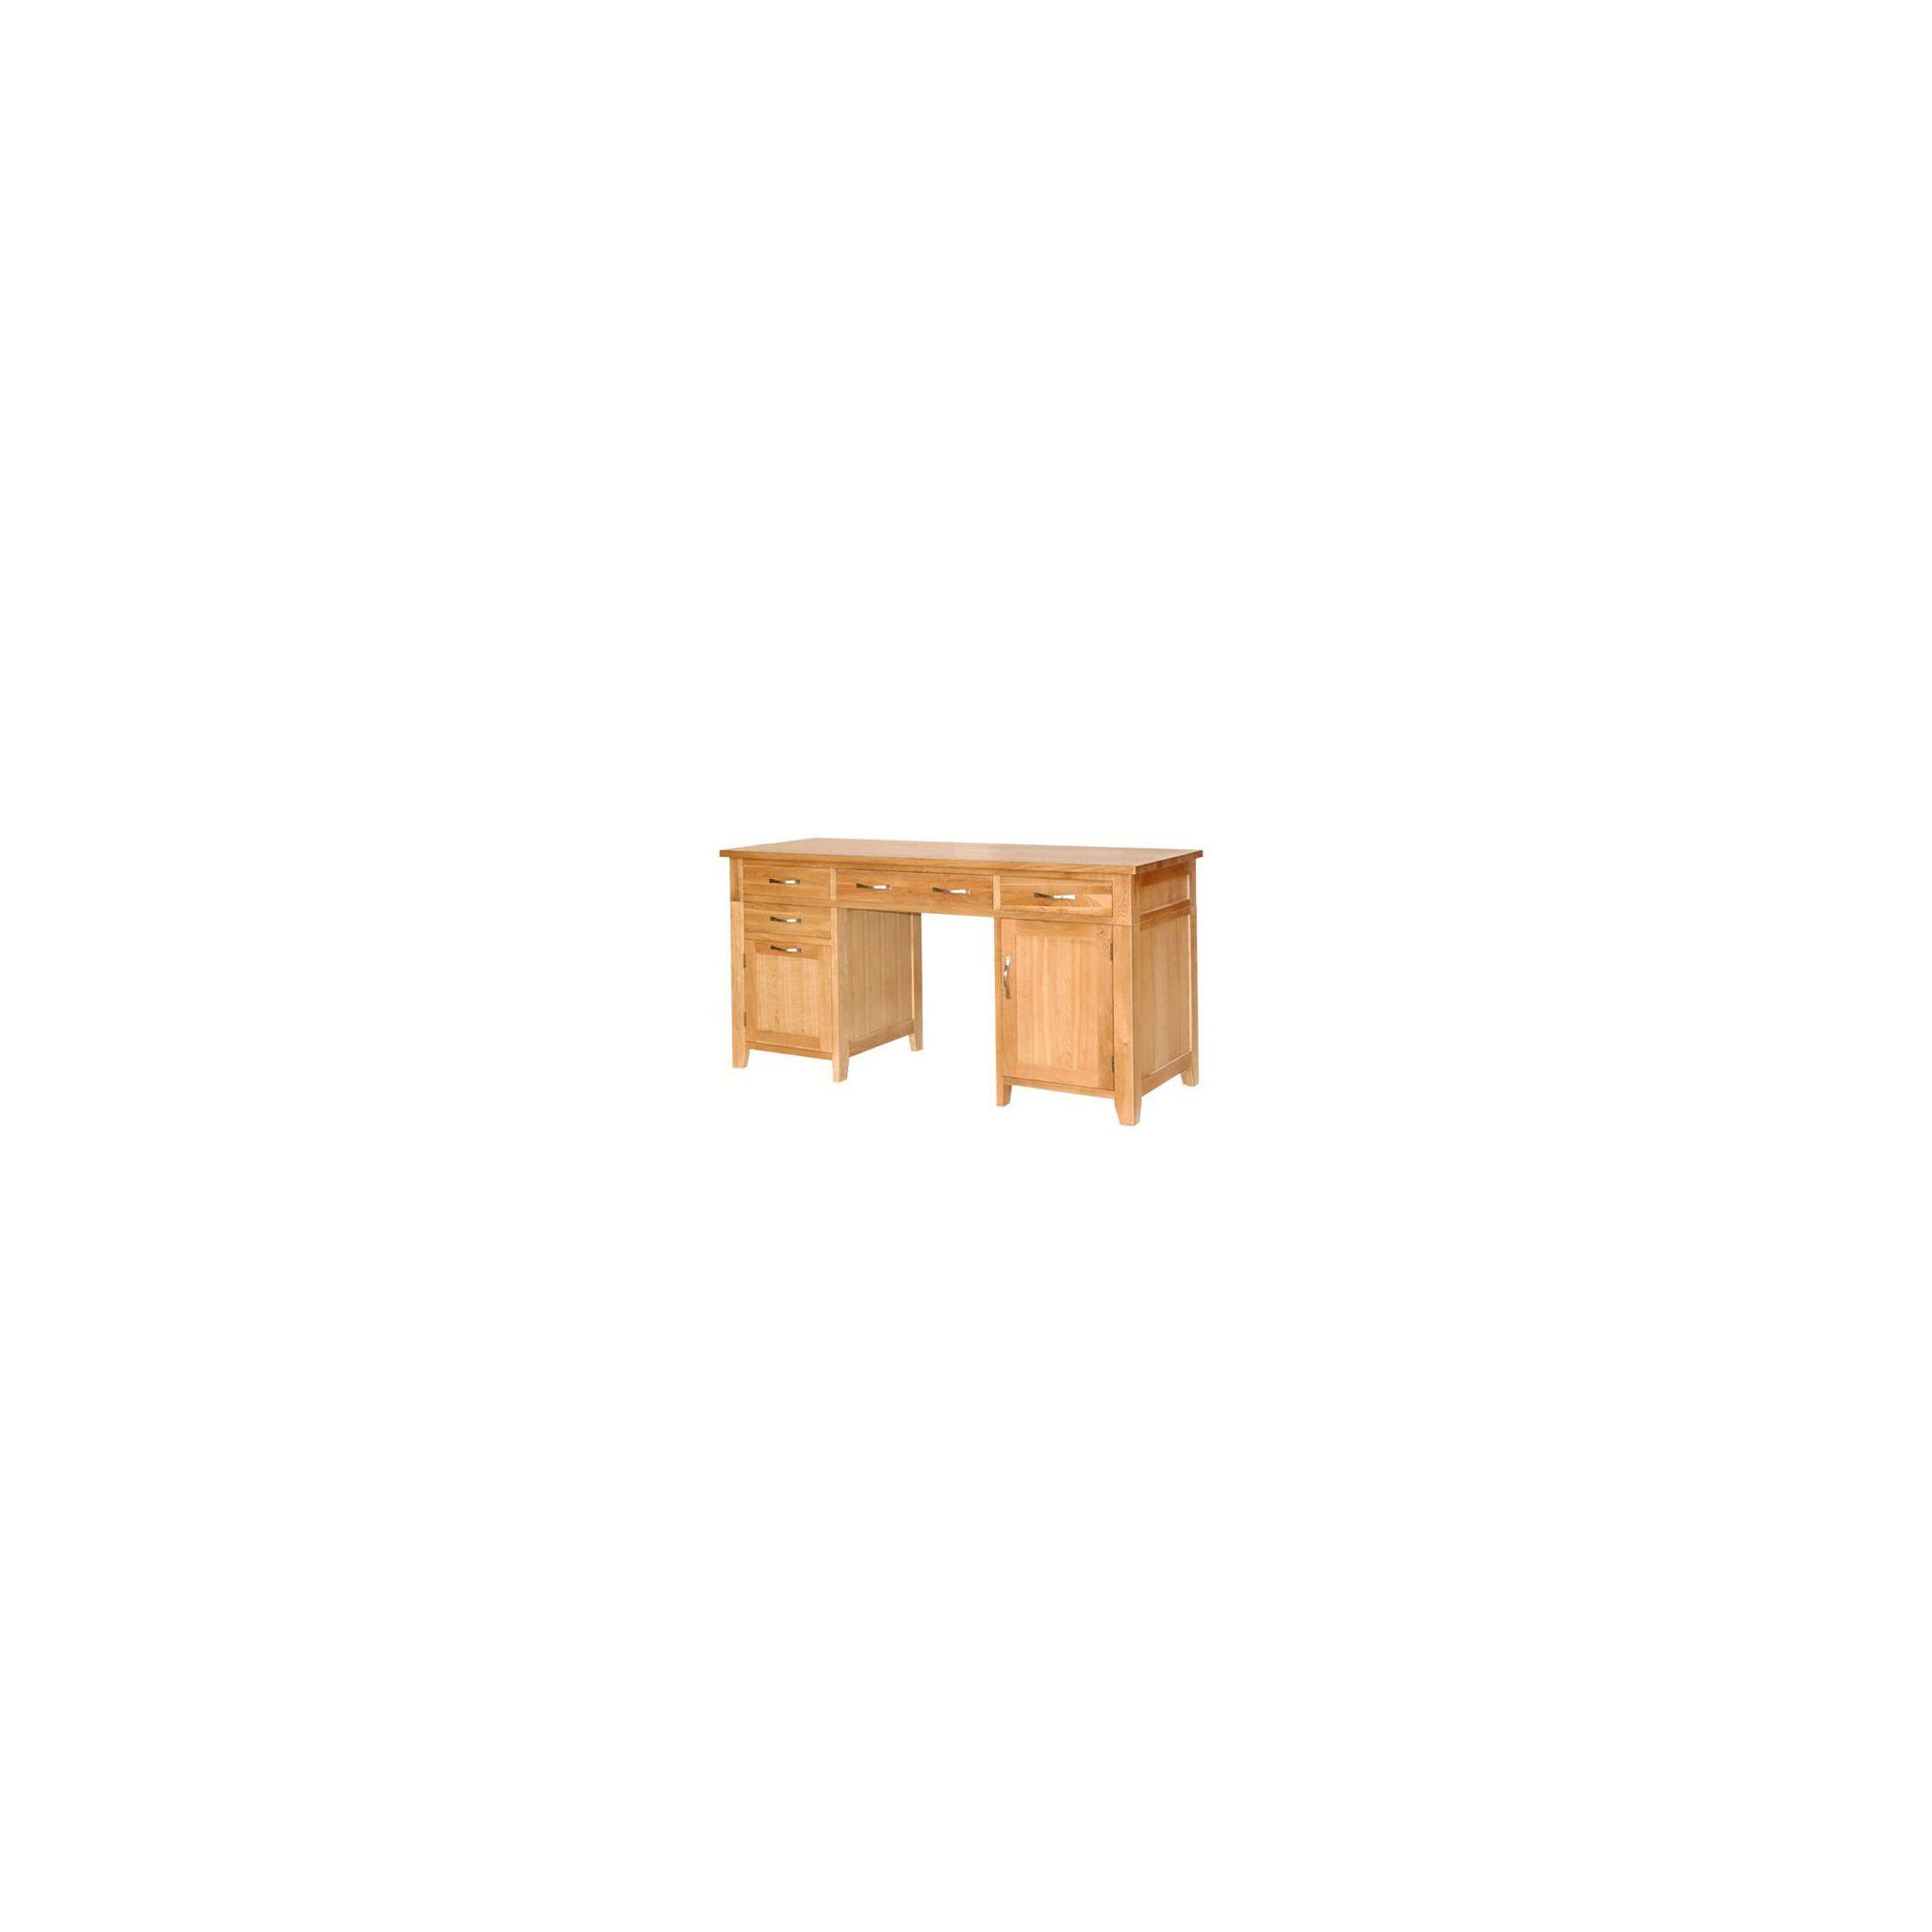 Ametis Sherwood Oak Double Pedestal Desk at Tesco Direct